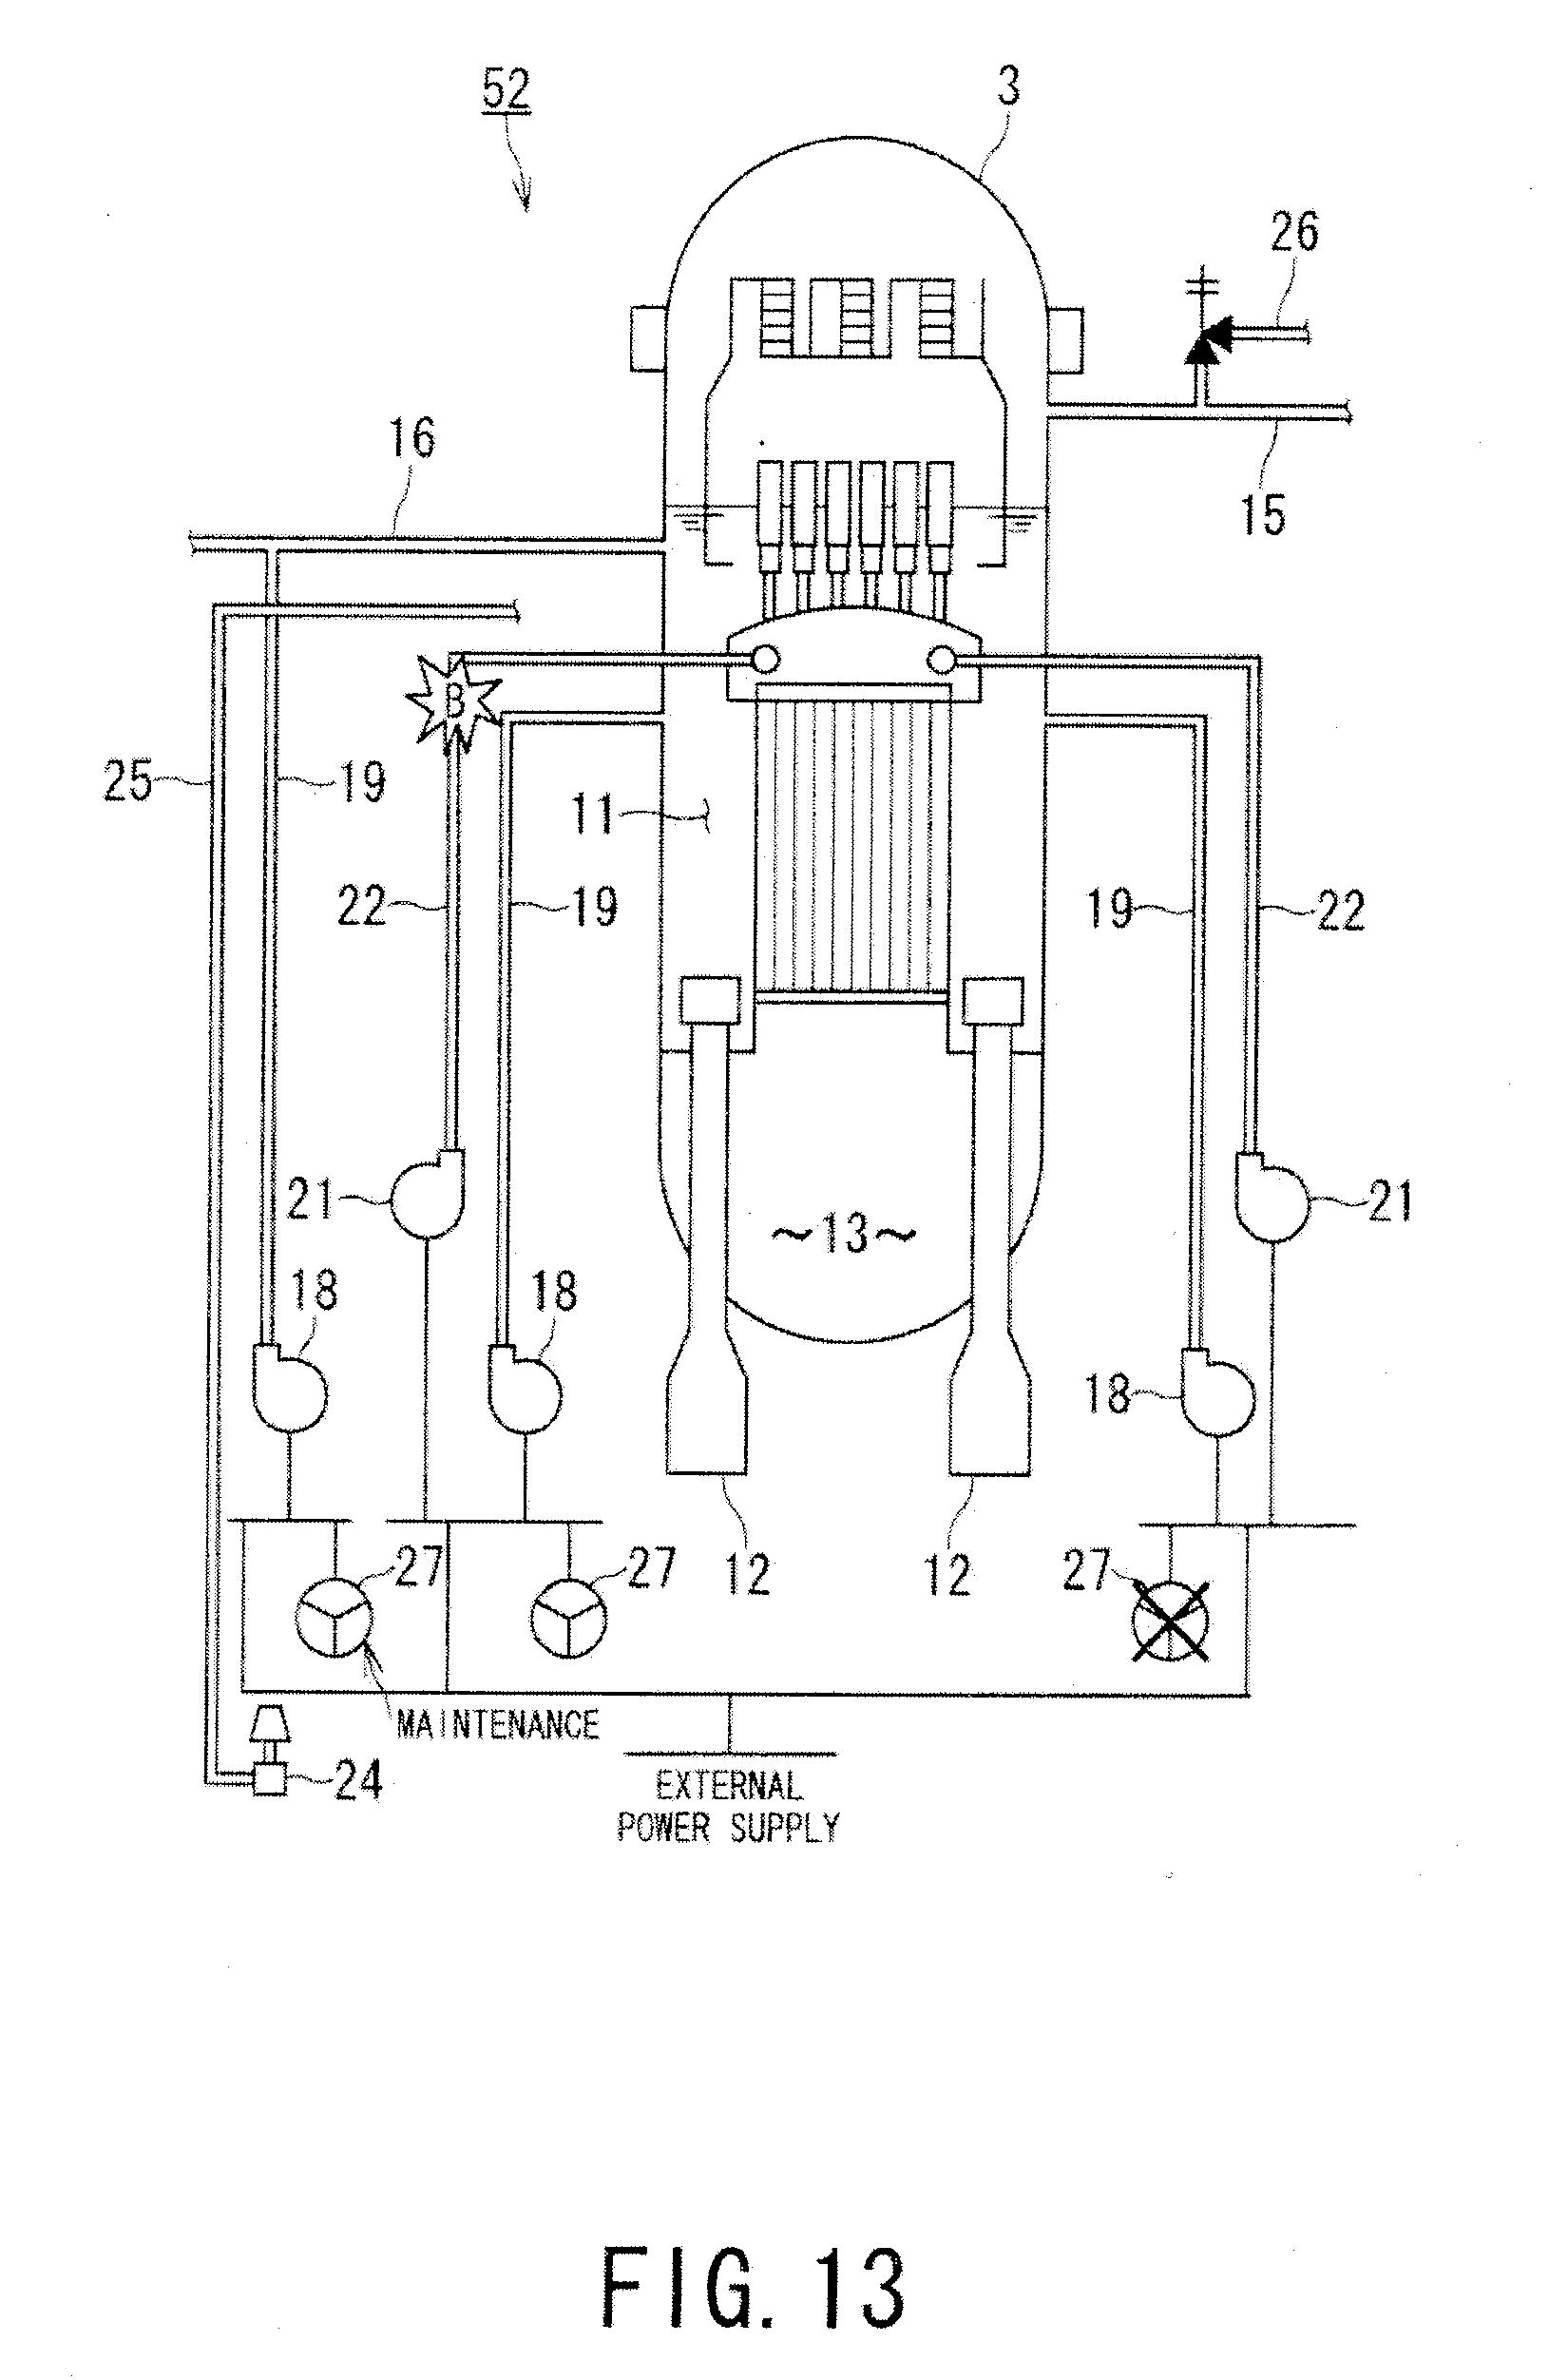 Nuclear High Pressure Core Spray